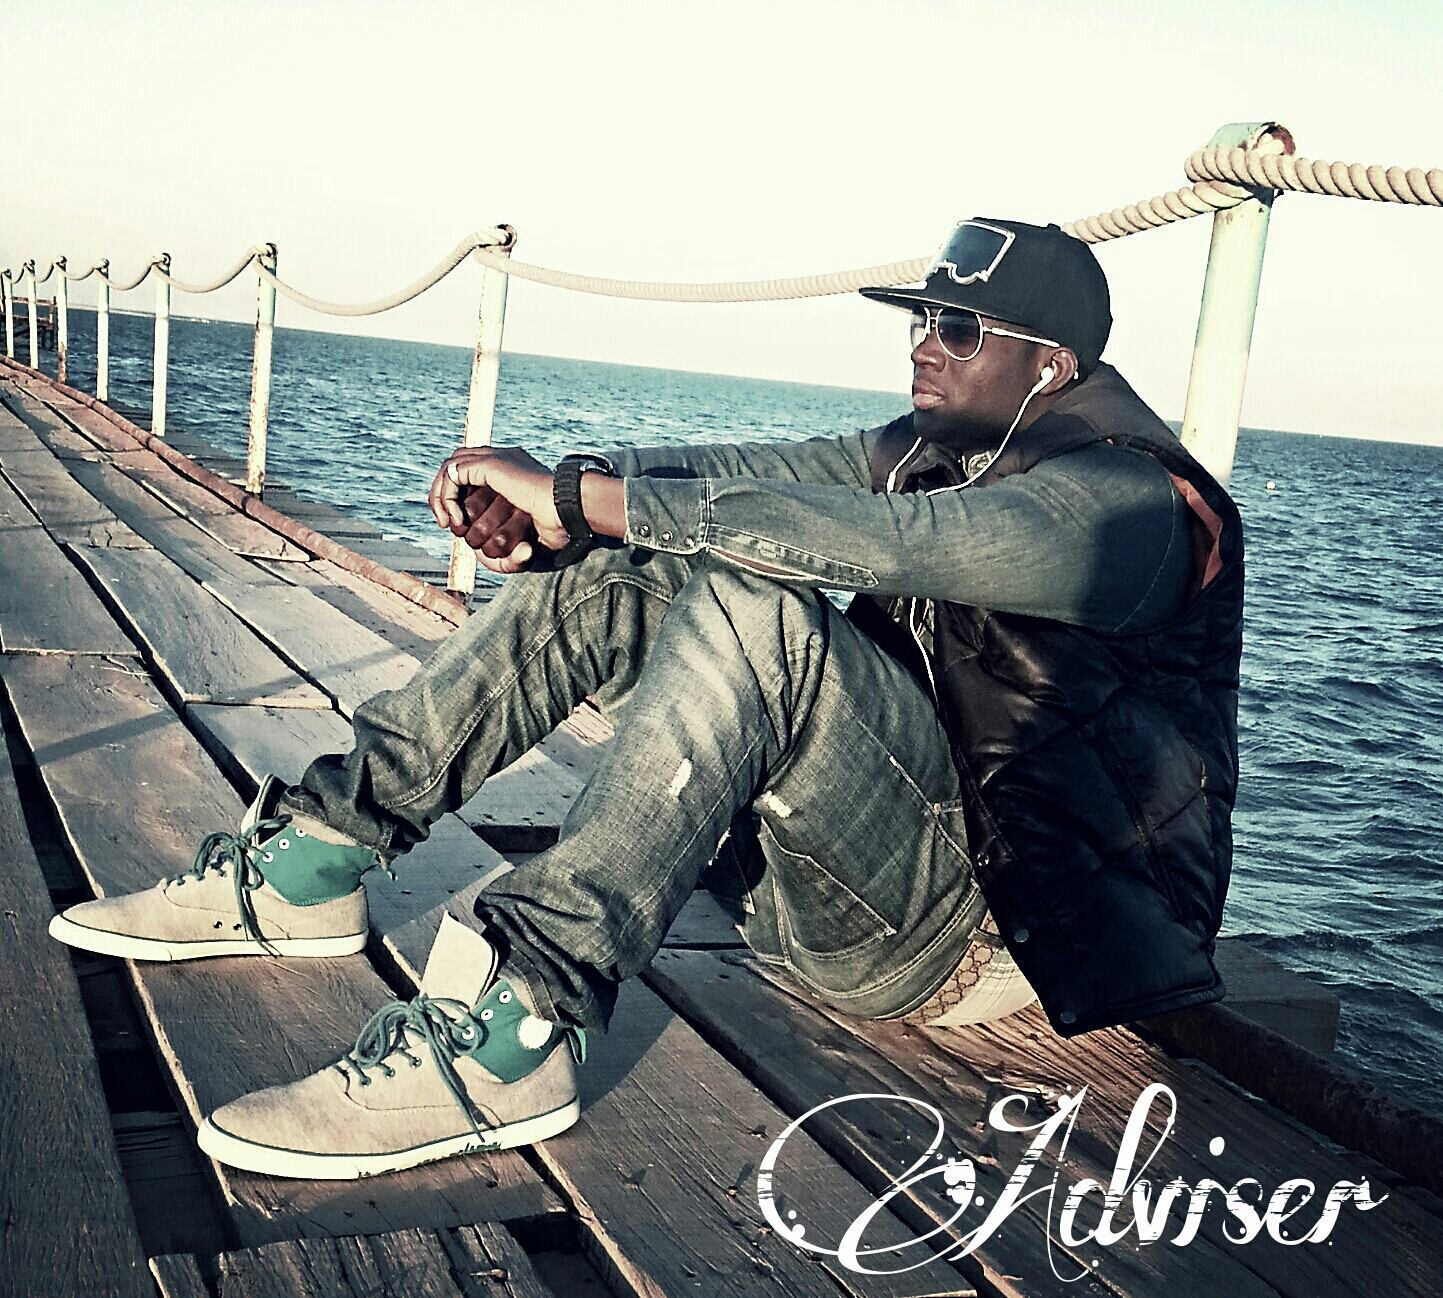 AFRICAN CULTURE | Hip-hop Concerts